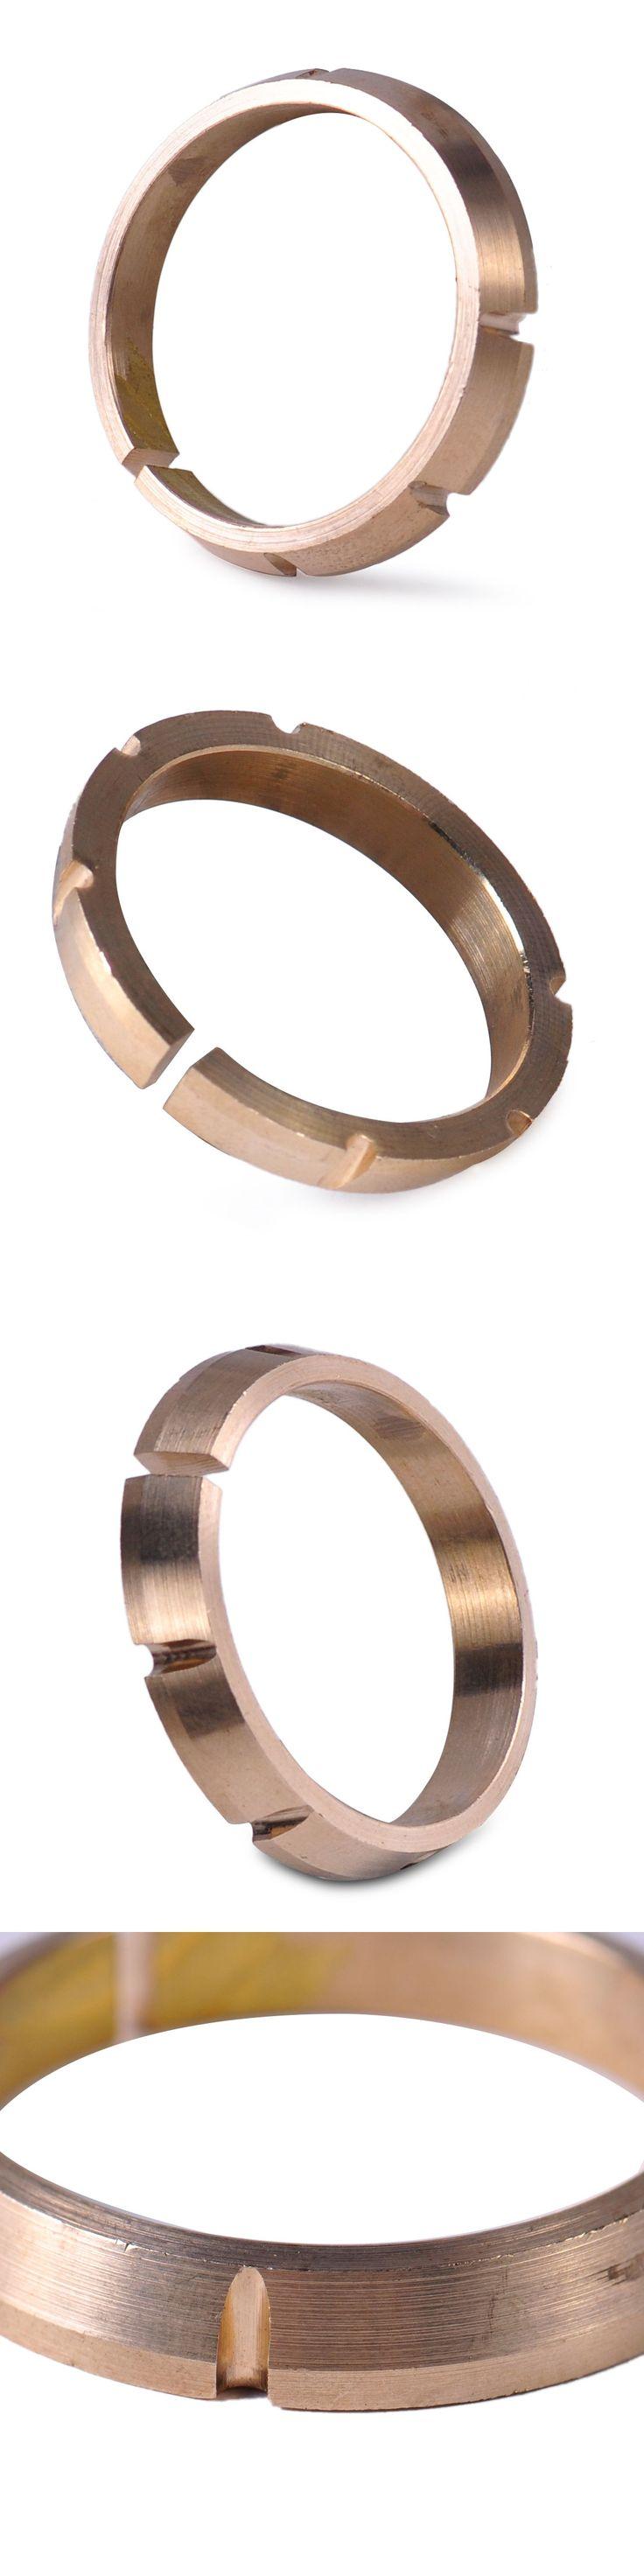 DWCX 020409374 Gearbox Differential Thrust Washer Brass Ring for VW Golf Jetta Passat Audi A3 TT 2000 2001 2002 2003 2004-2013